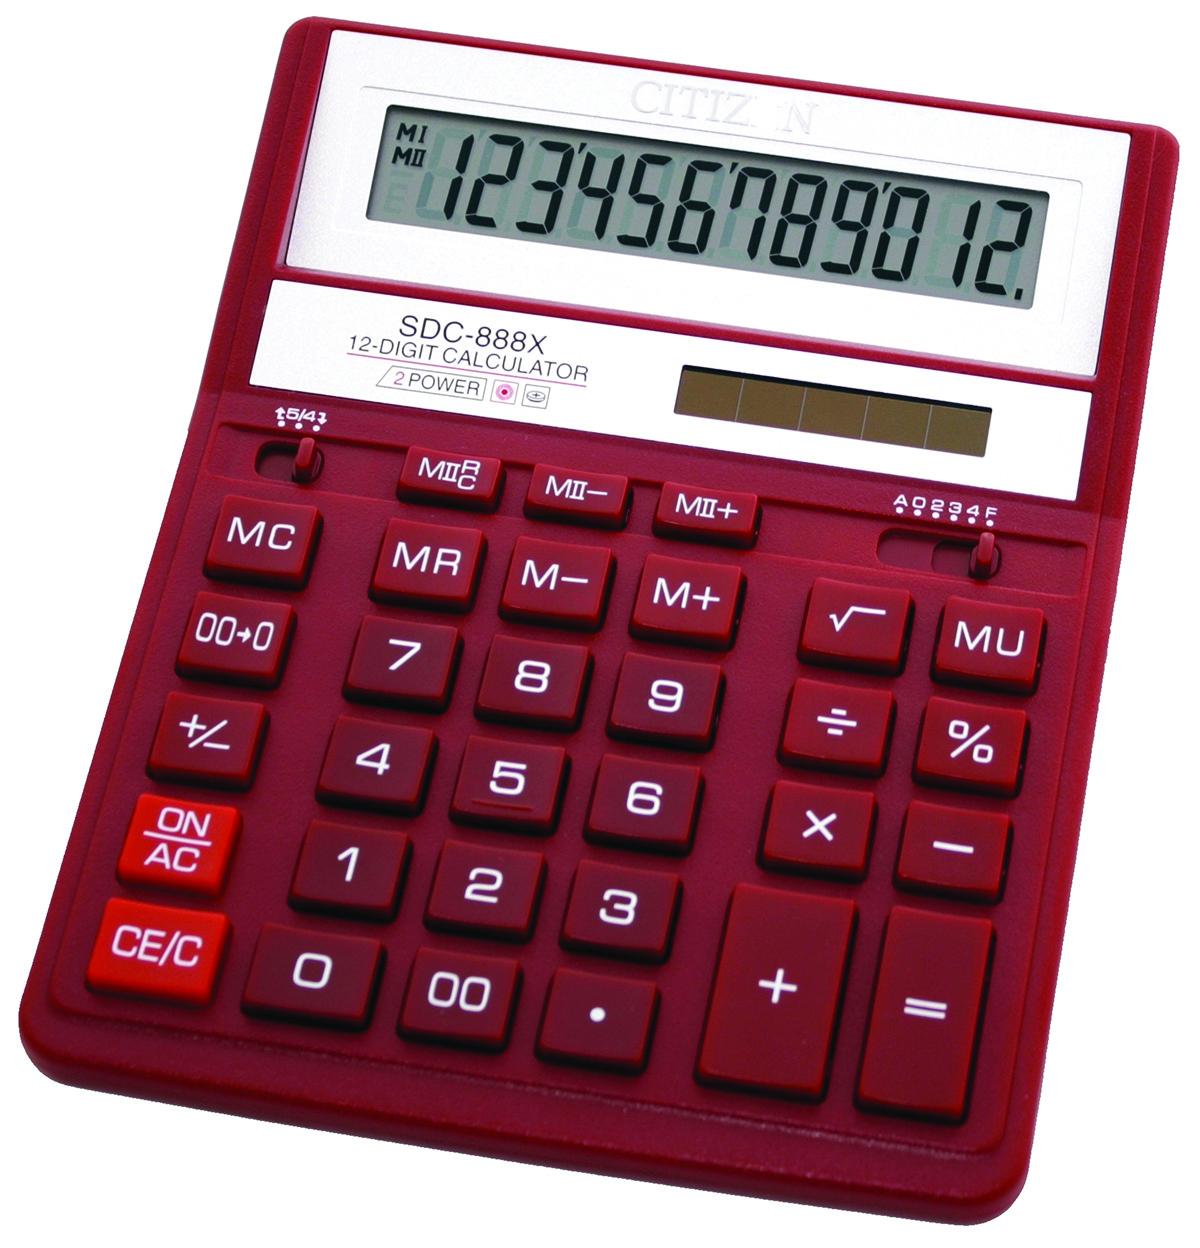 Office Calculator Citizen Sdc 888xrd 12 Digit 203x158mm Red Big Photo